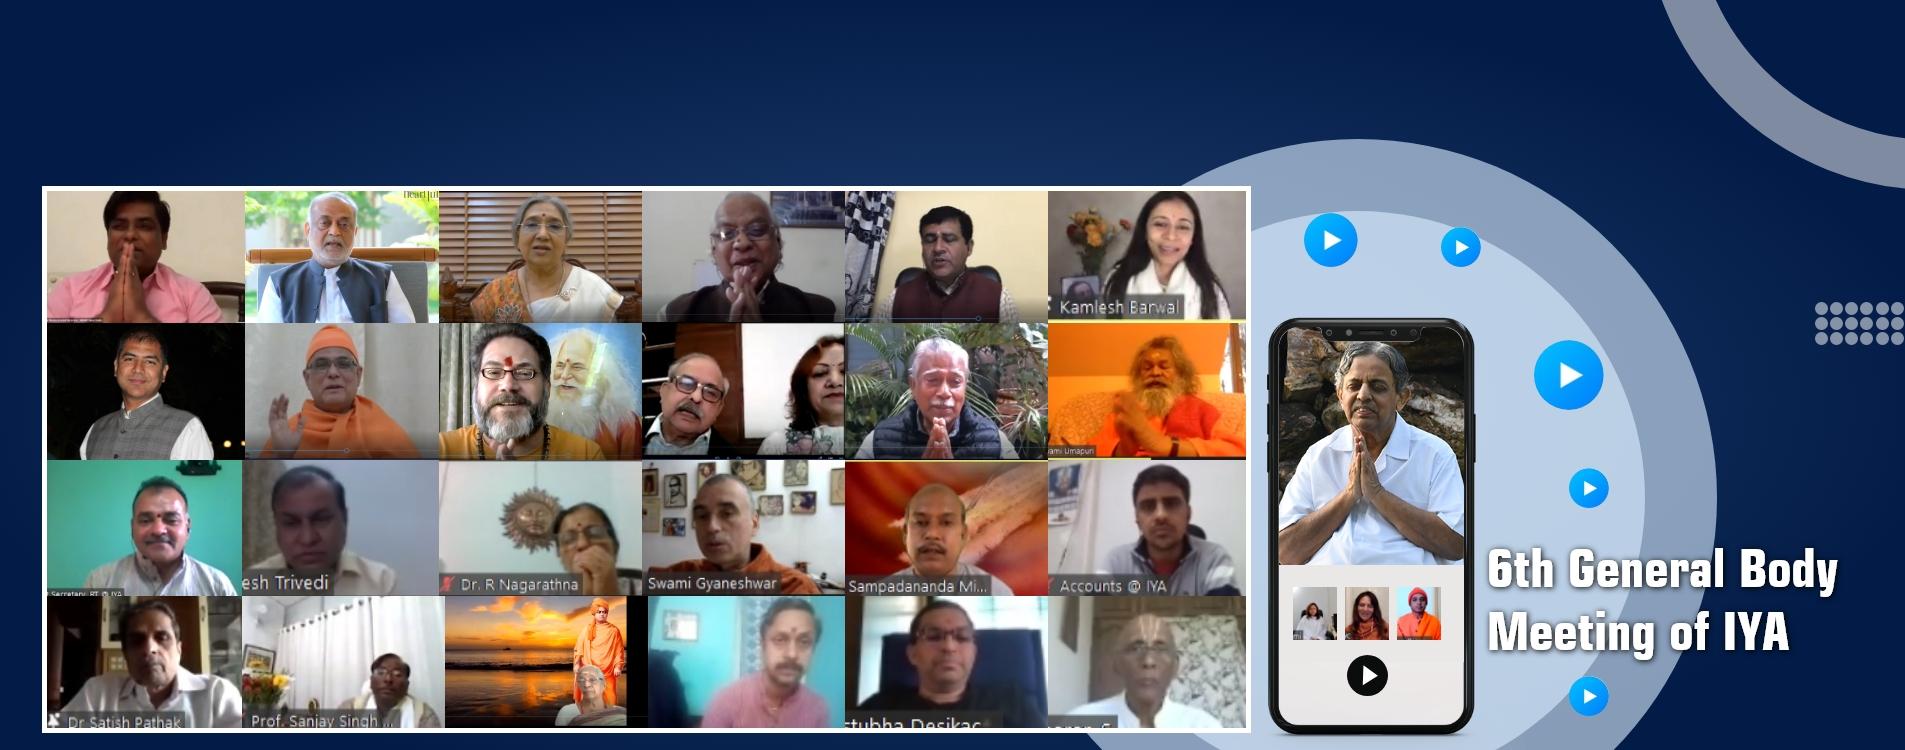 6th General Body Meeting of IYA-202